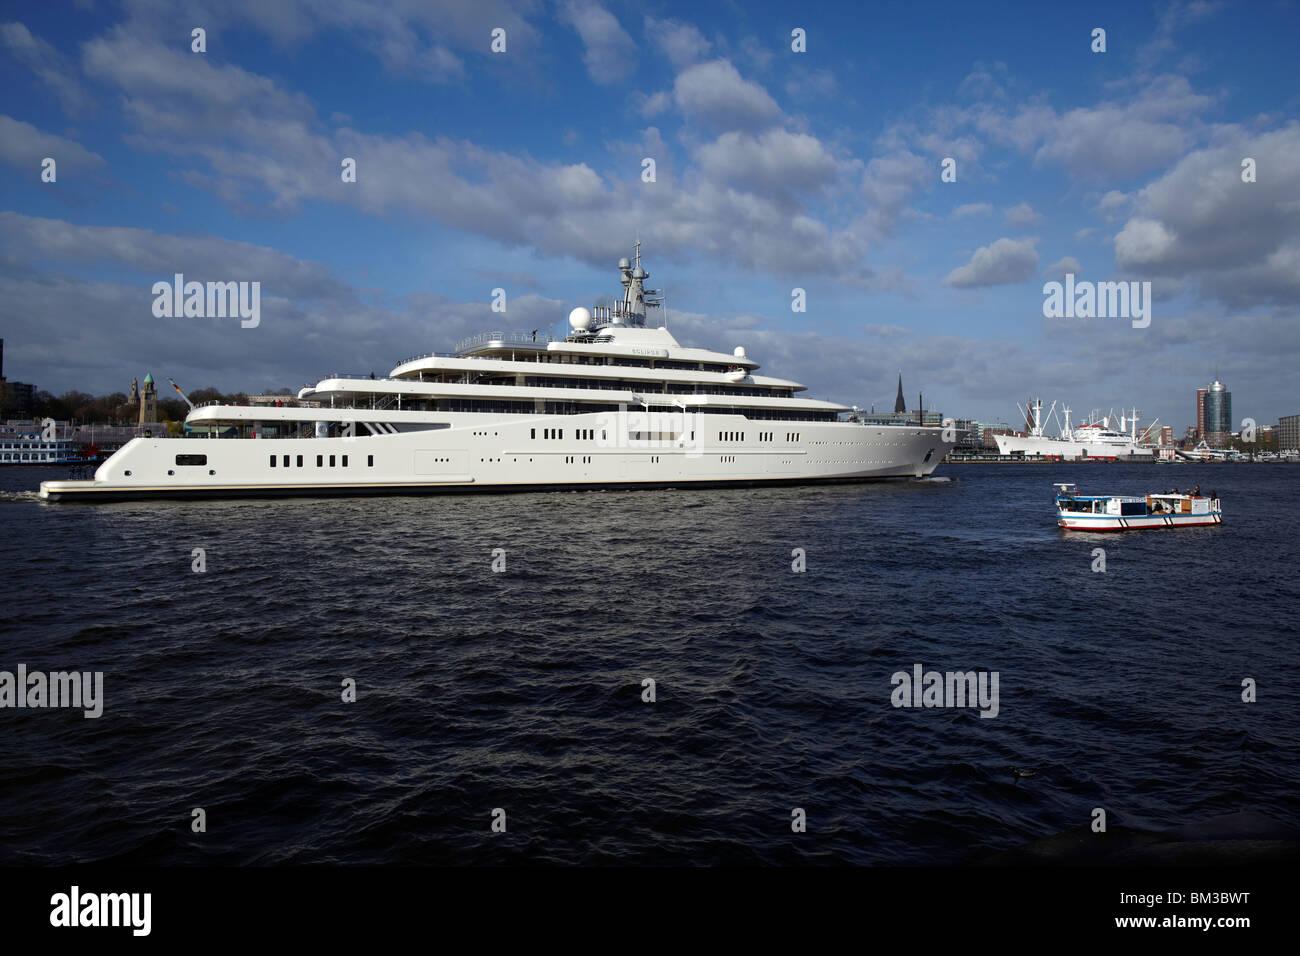 2010 April 16. Hamburg, Germany. Roman Abramovich yacht Eclipse leaves the Blohm + Voss ship yard. - Stock Image